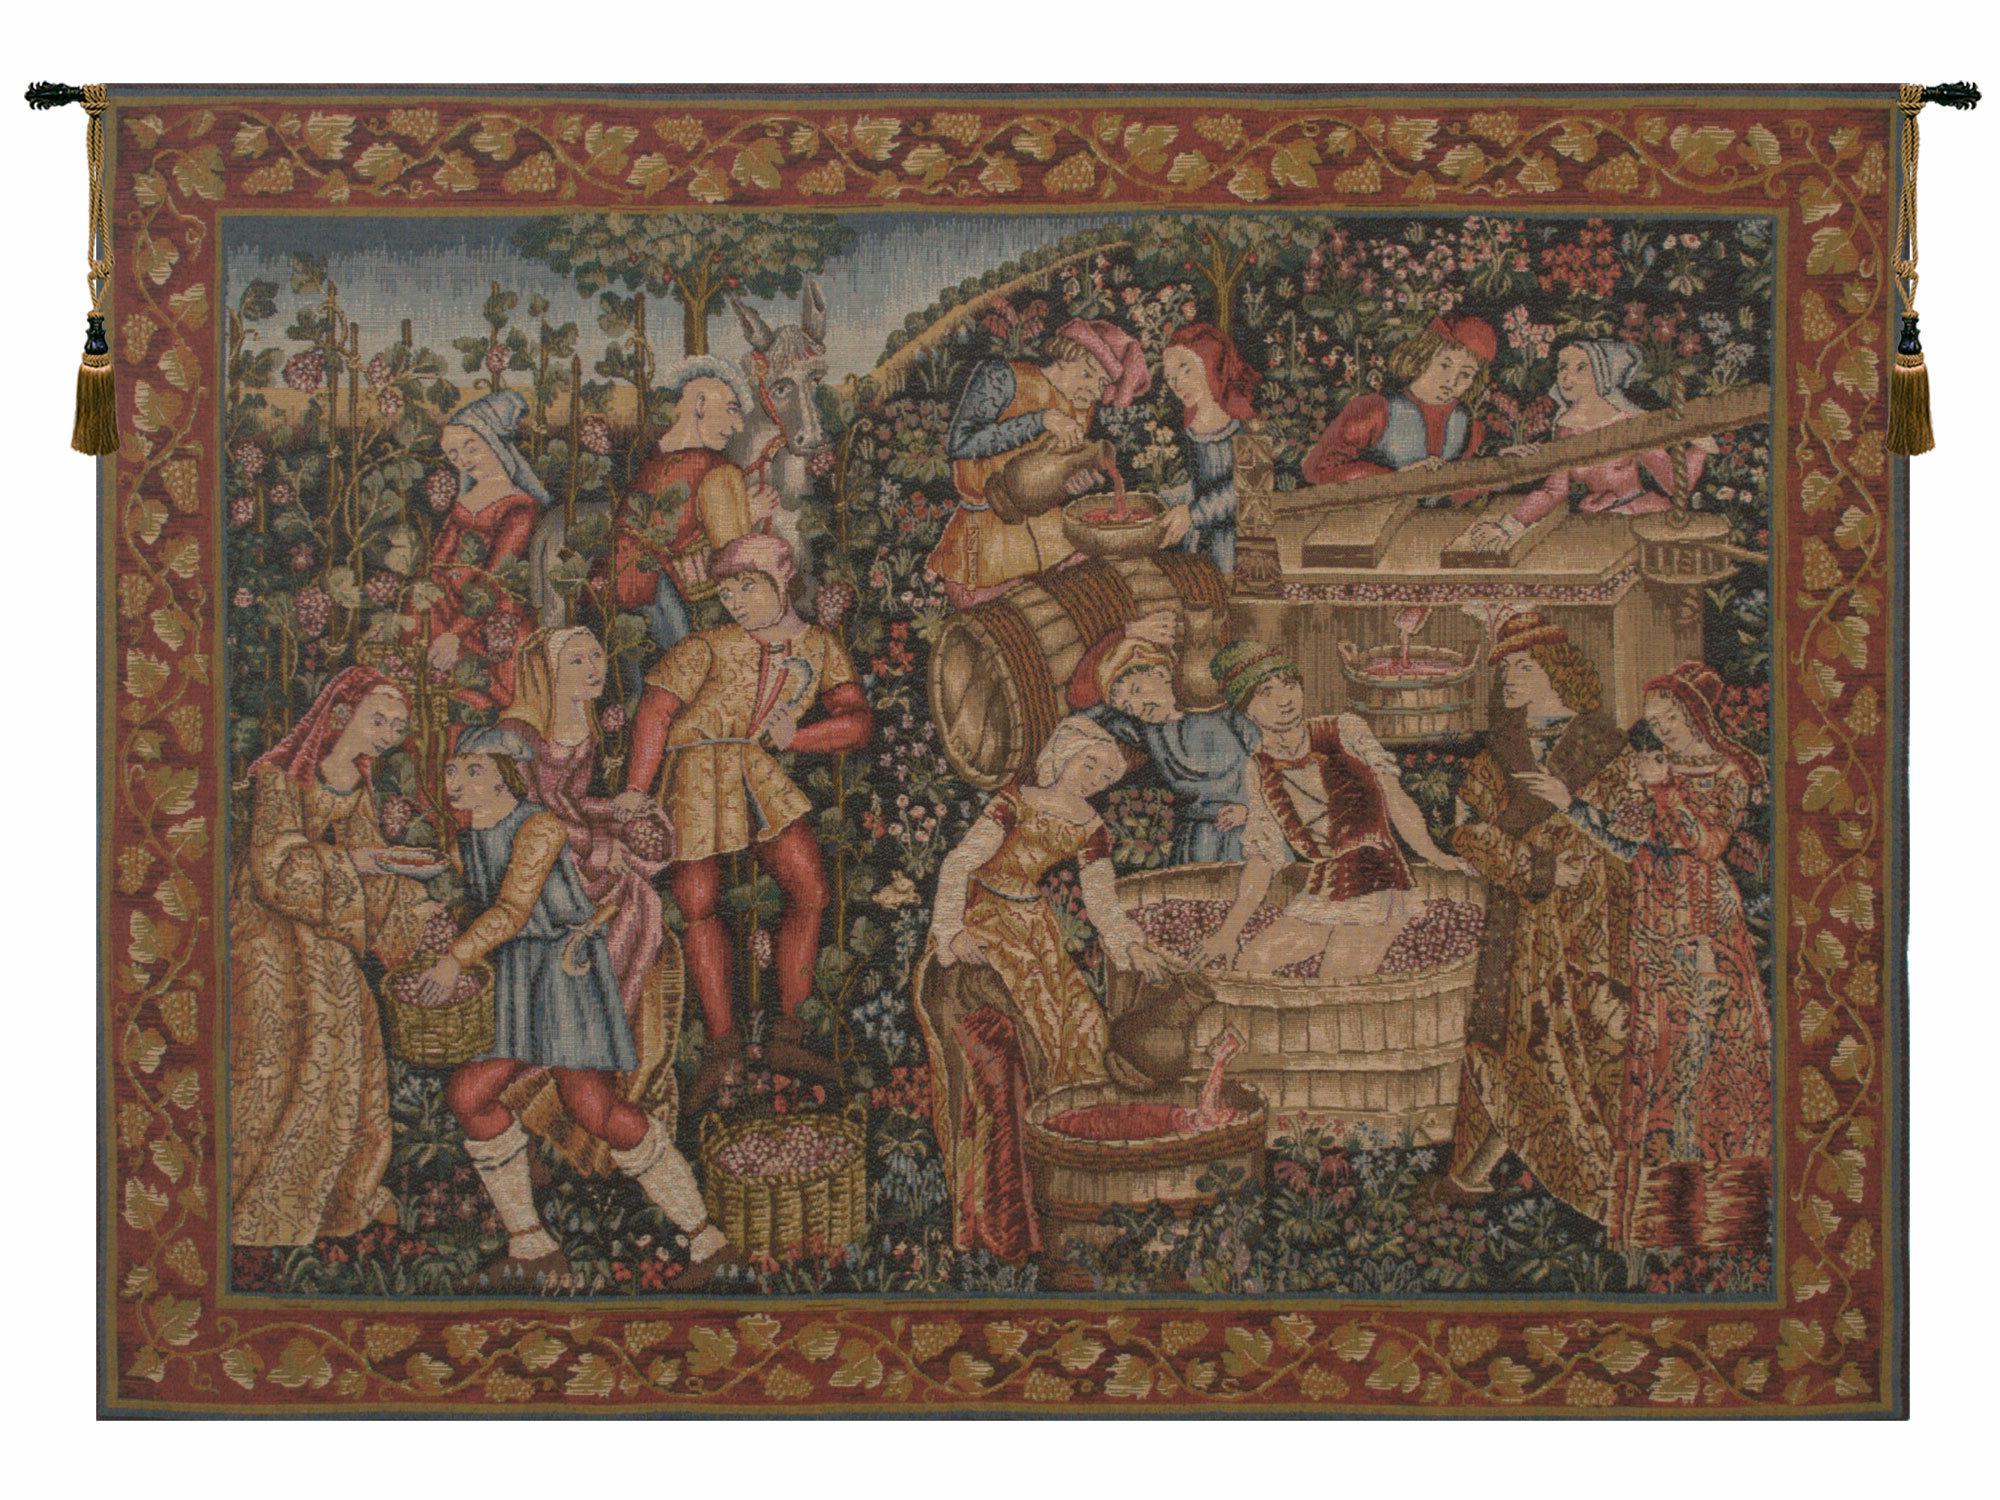 Most Current Lion I European Tapestries Regarding Grandes Vendanges European Tapestry (View 18 of 20)